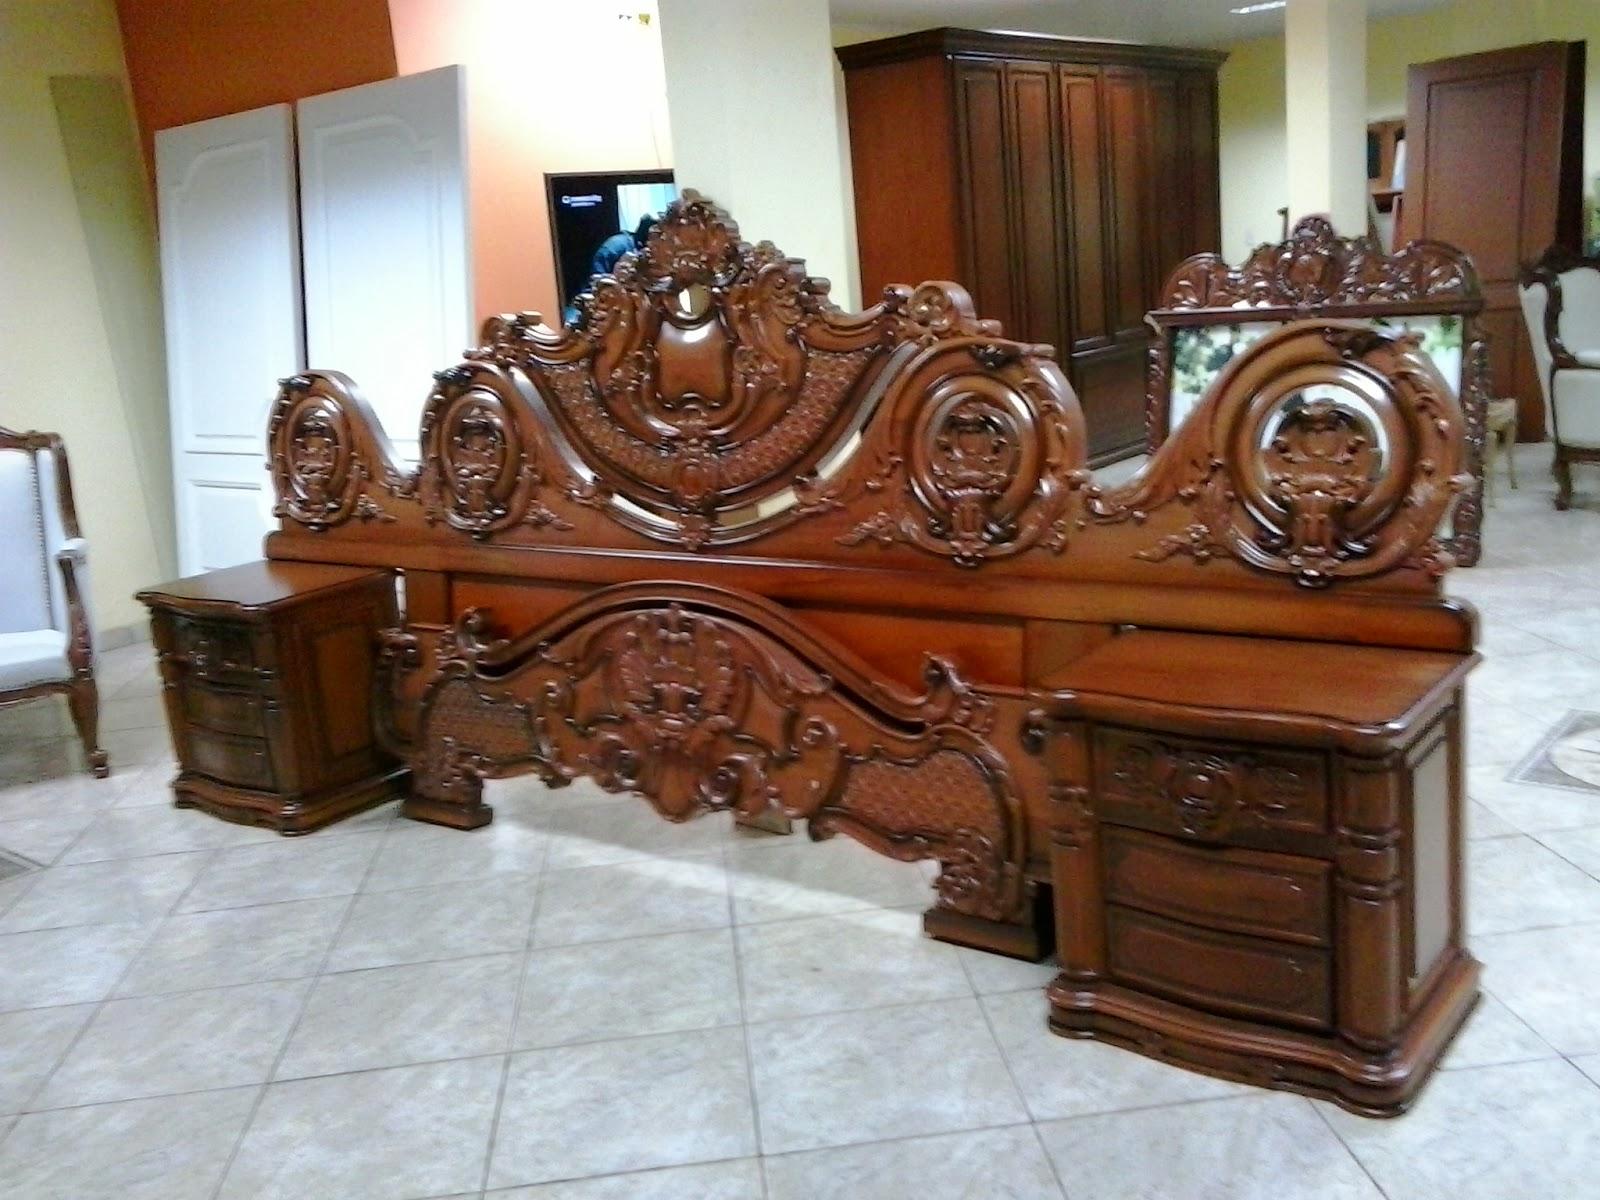 Arte en madera super cama tallada a mano for Muebles tallados en madera